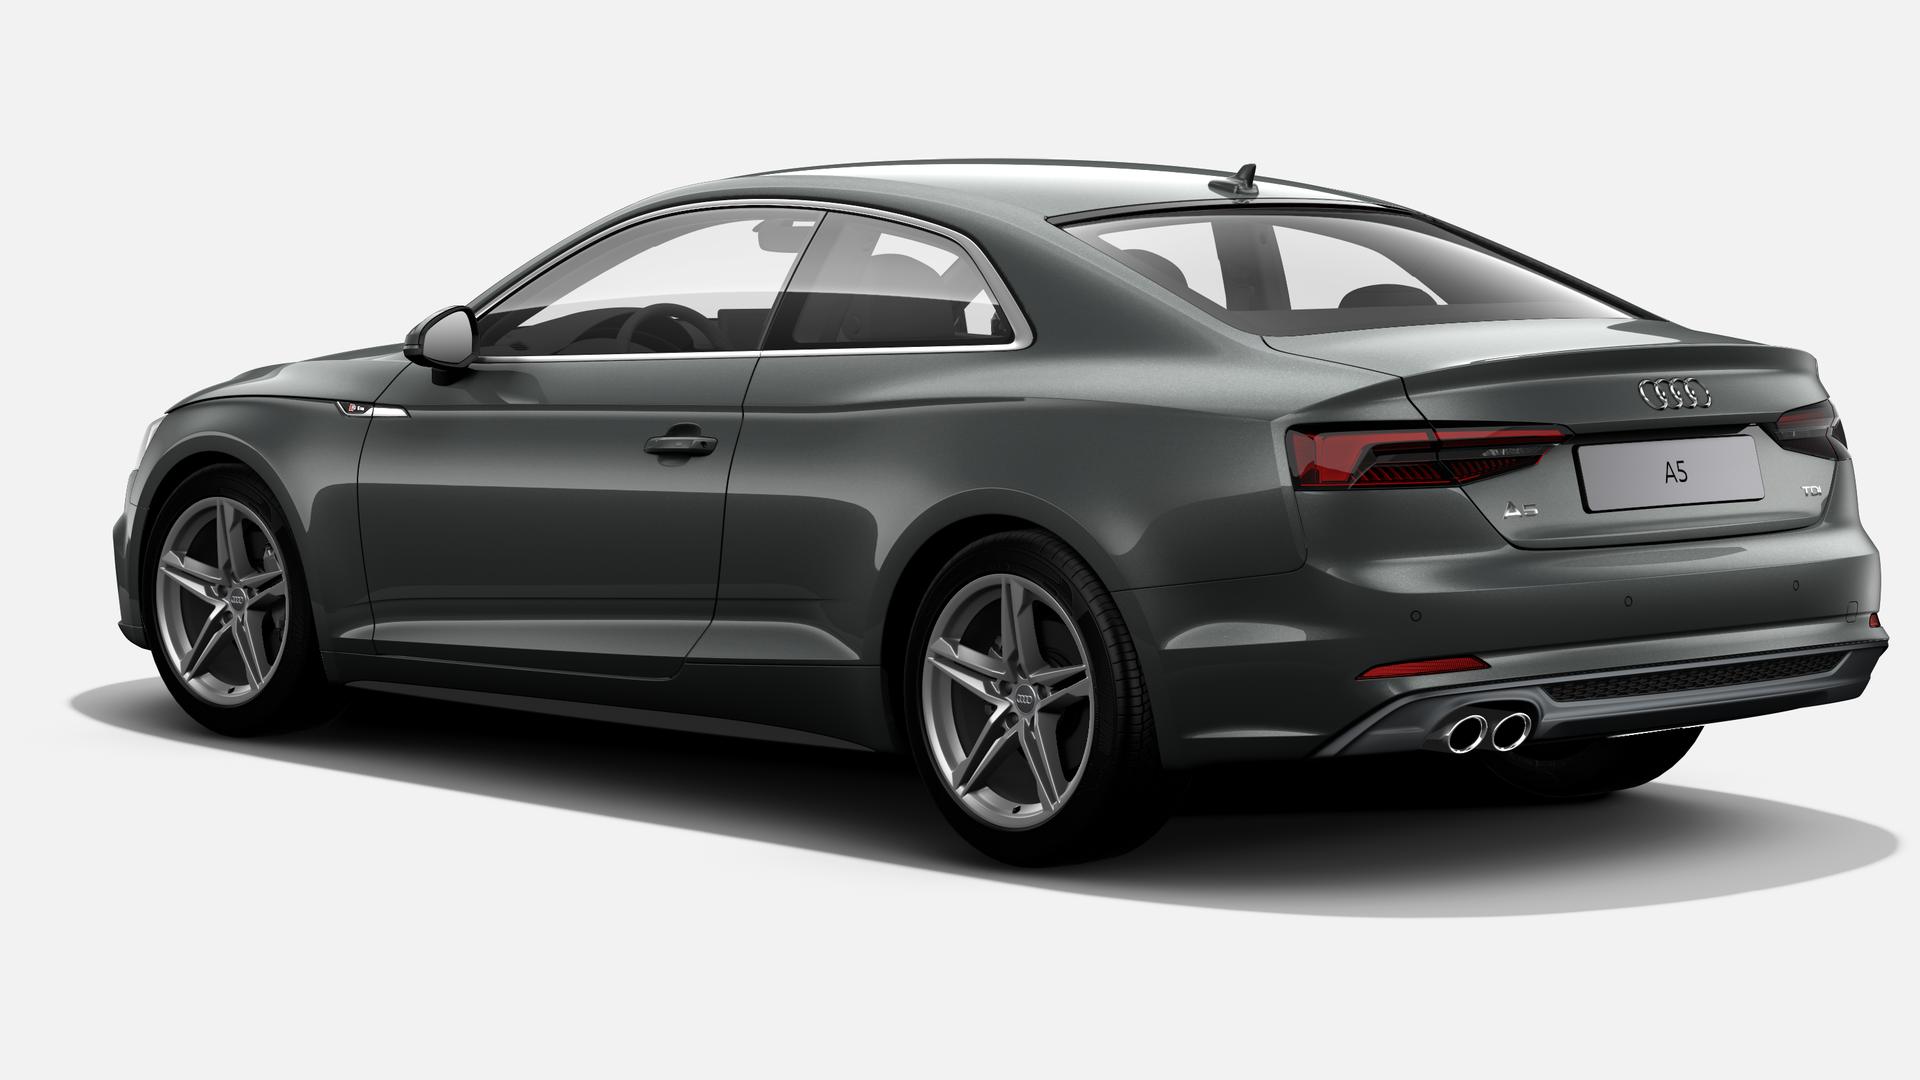 Vista Tres cuartos trasera izquierda de Audi A5 Coupe 2.0 TDI S line S tronic 140 kW (190 CV)